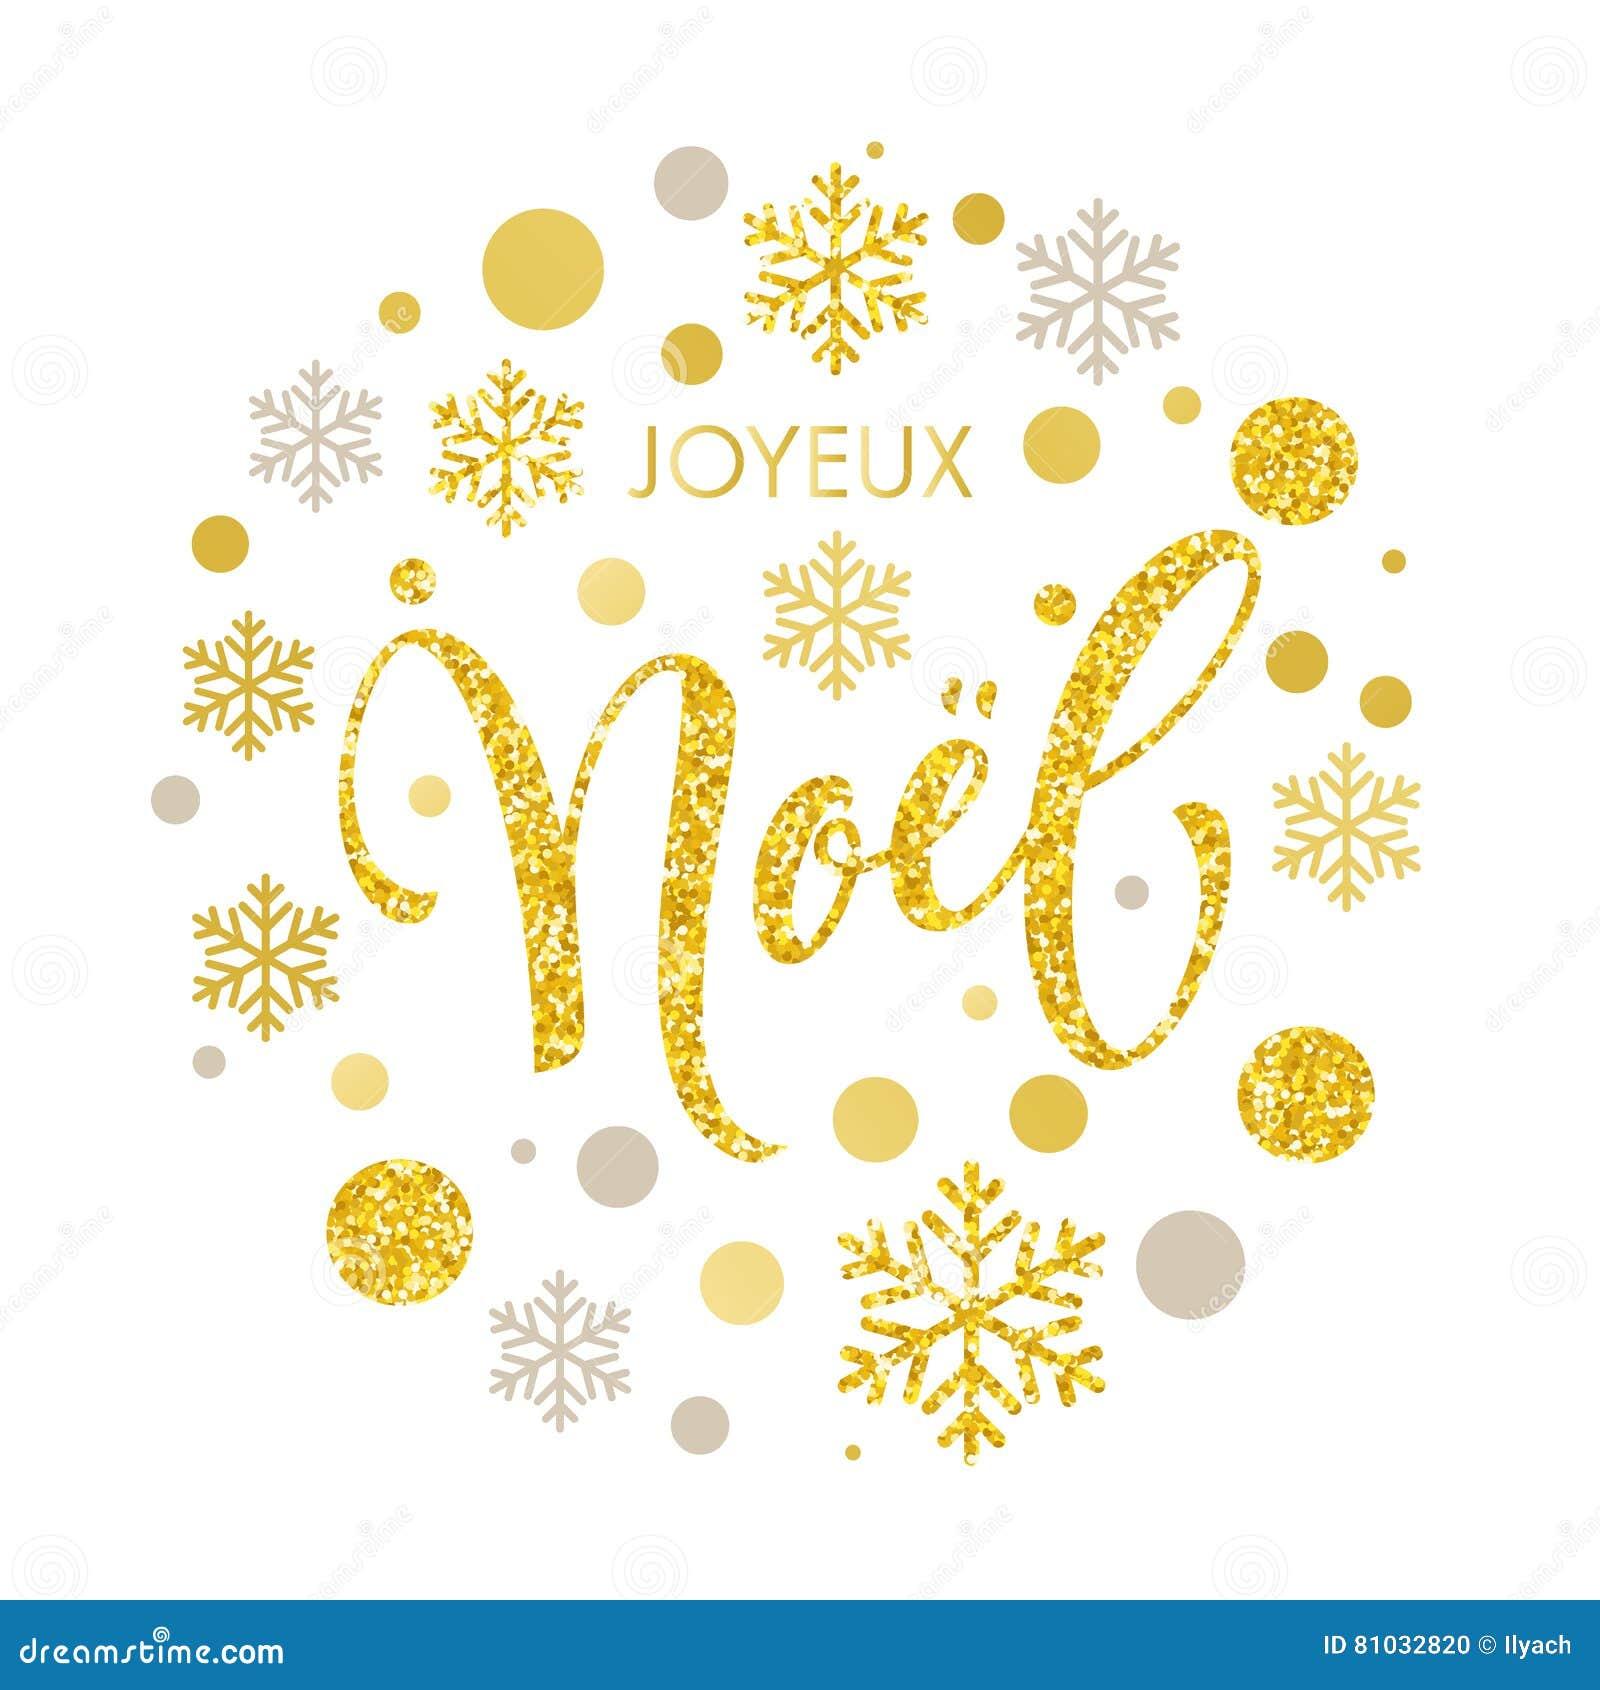 Christmas in french noel text ornament for greeting card stock download christmas in french noel text ornament for greeting card stock illustration illustration of joyeux m4hsunfo